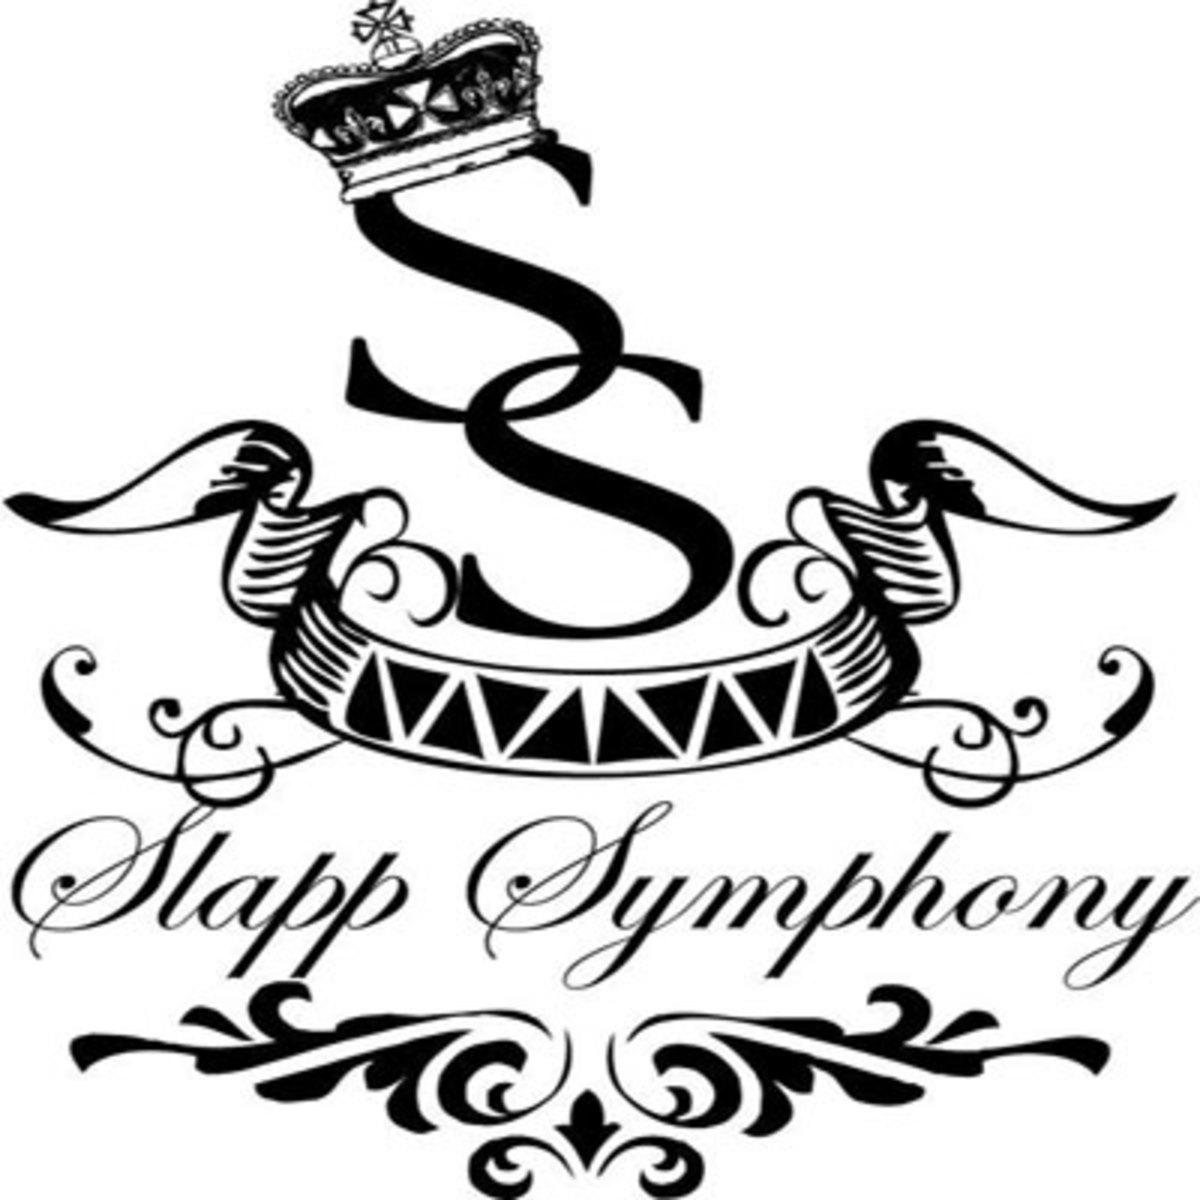 slappsymphony.jpg